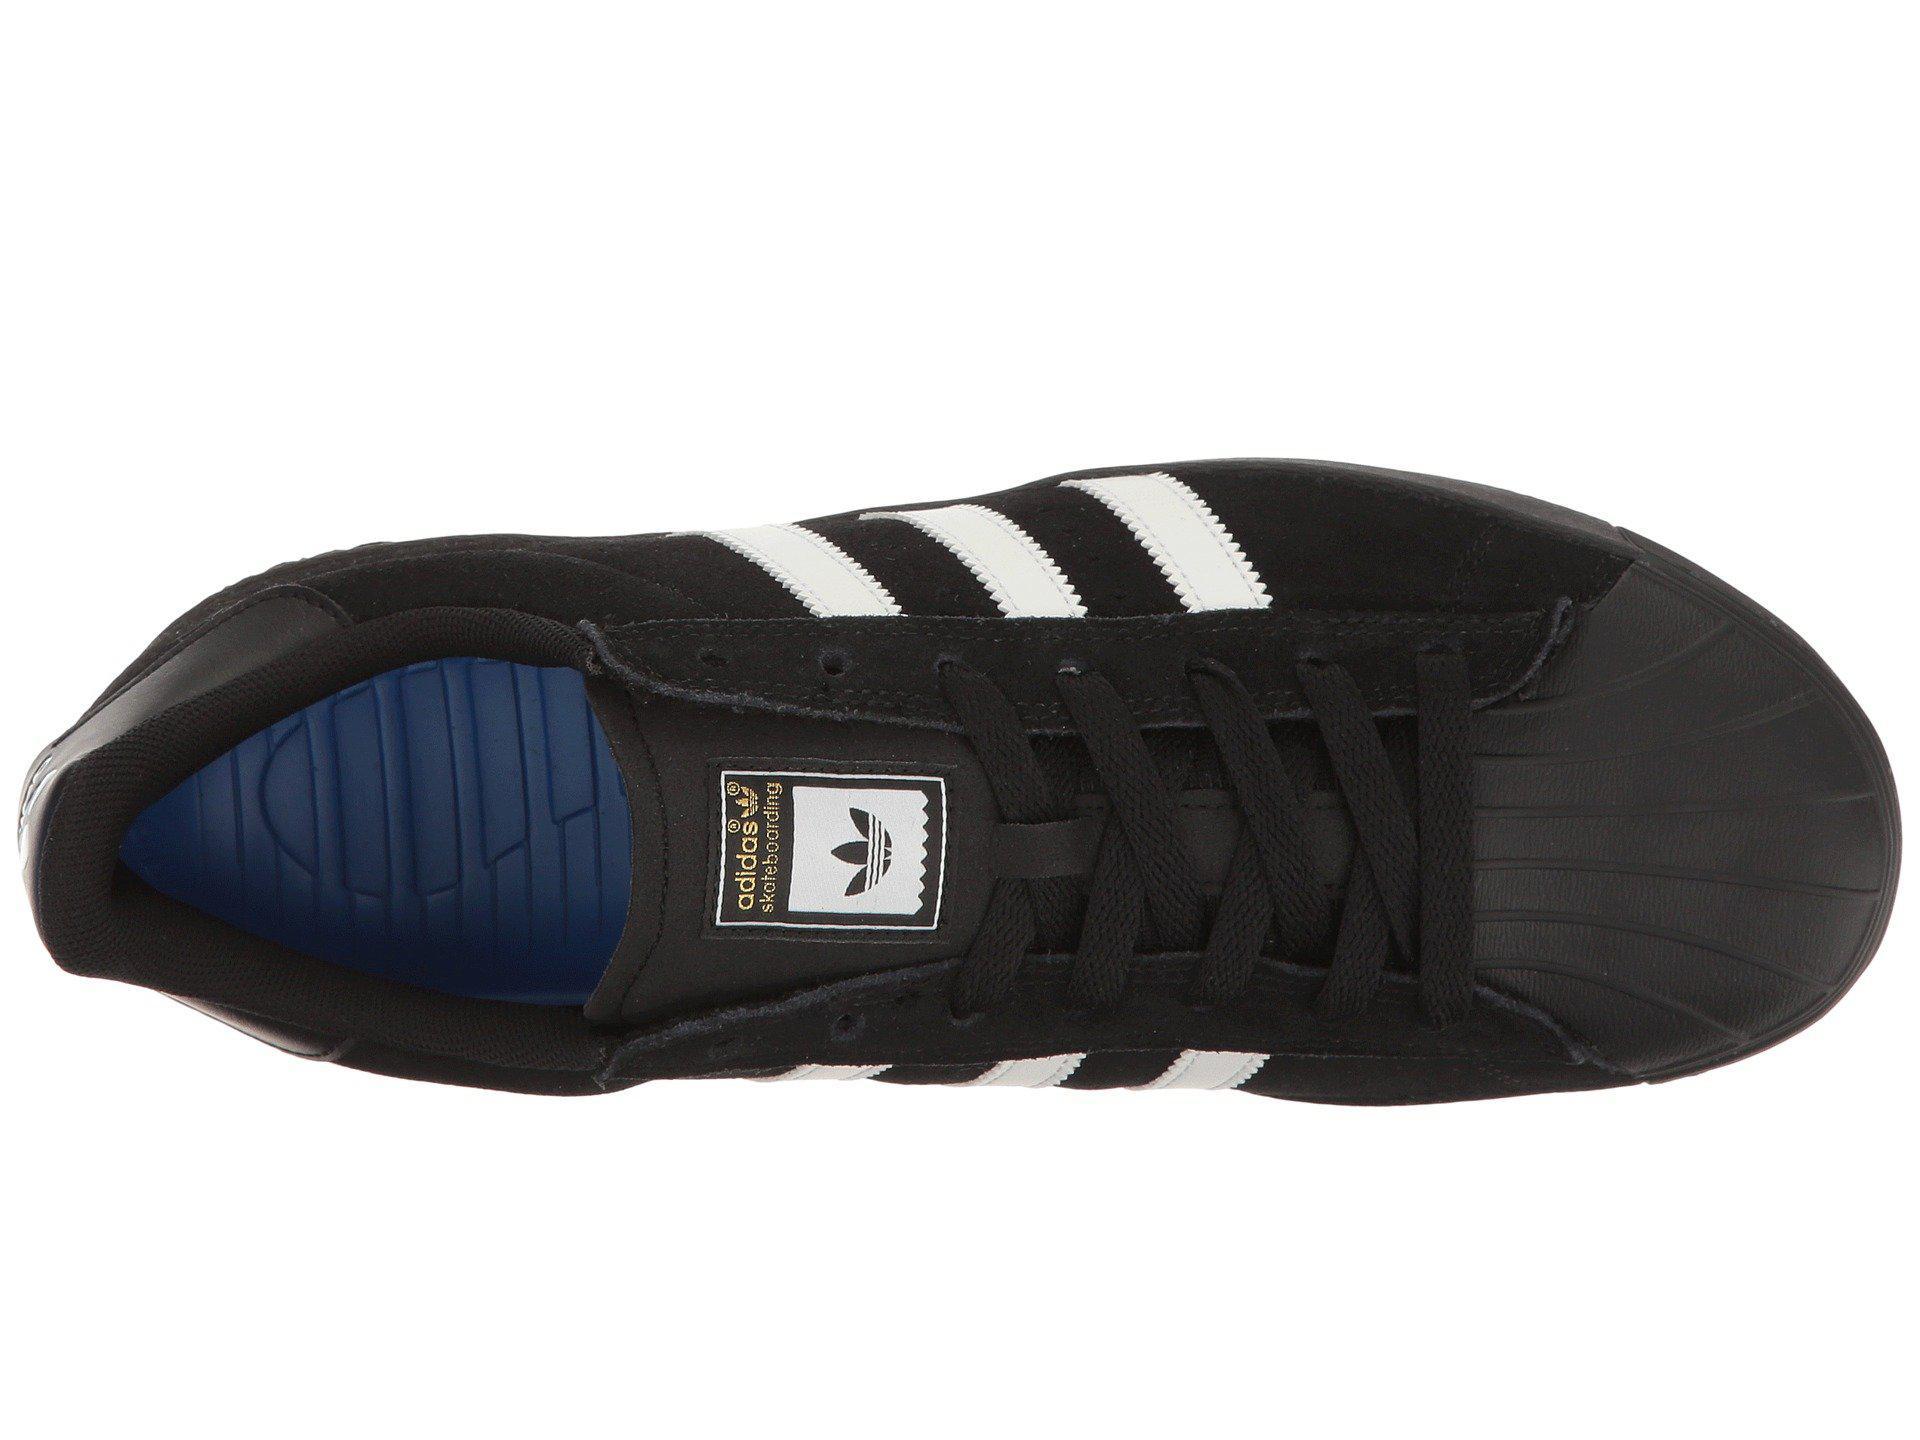 the latest 5e687 6656a Adidas Originals - Superstar Vulc Adv (white black white) Skate Shoes for.  View fullscreen